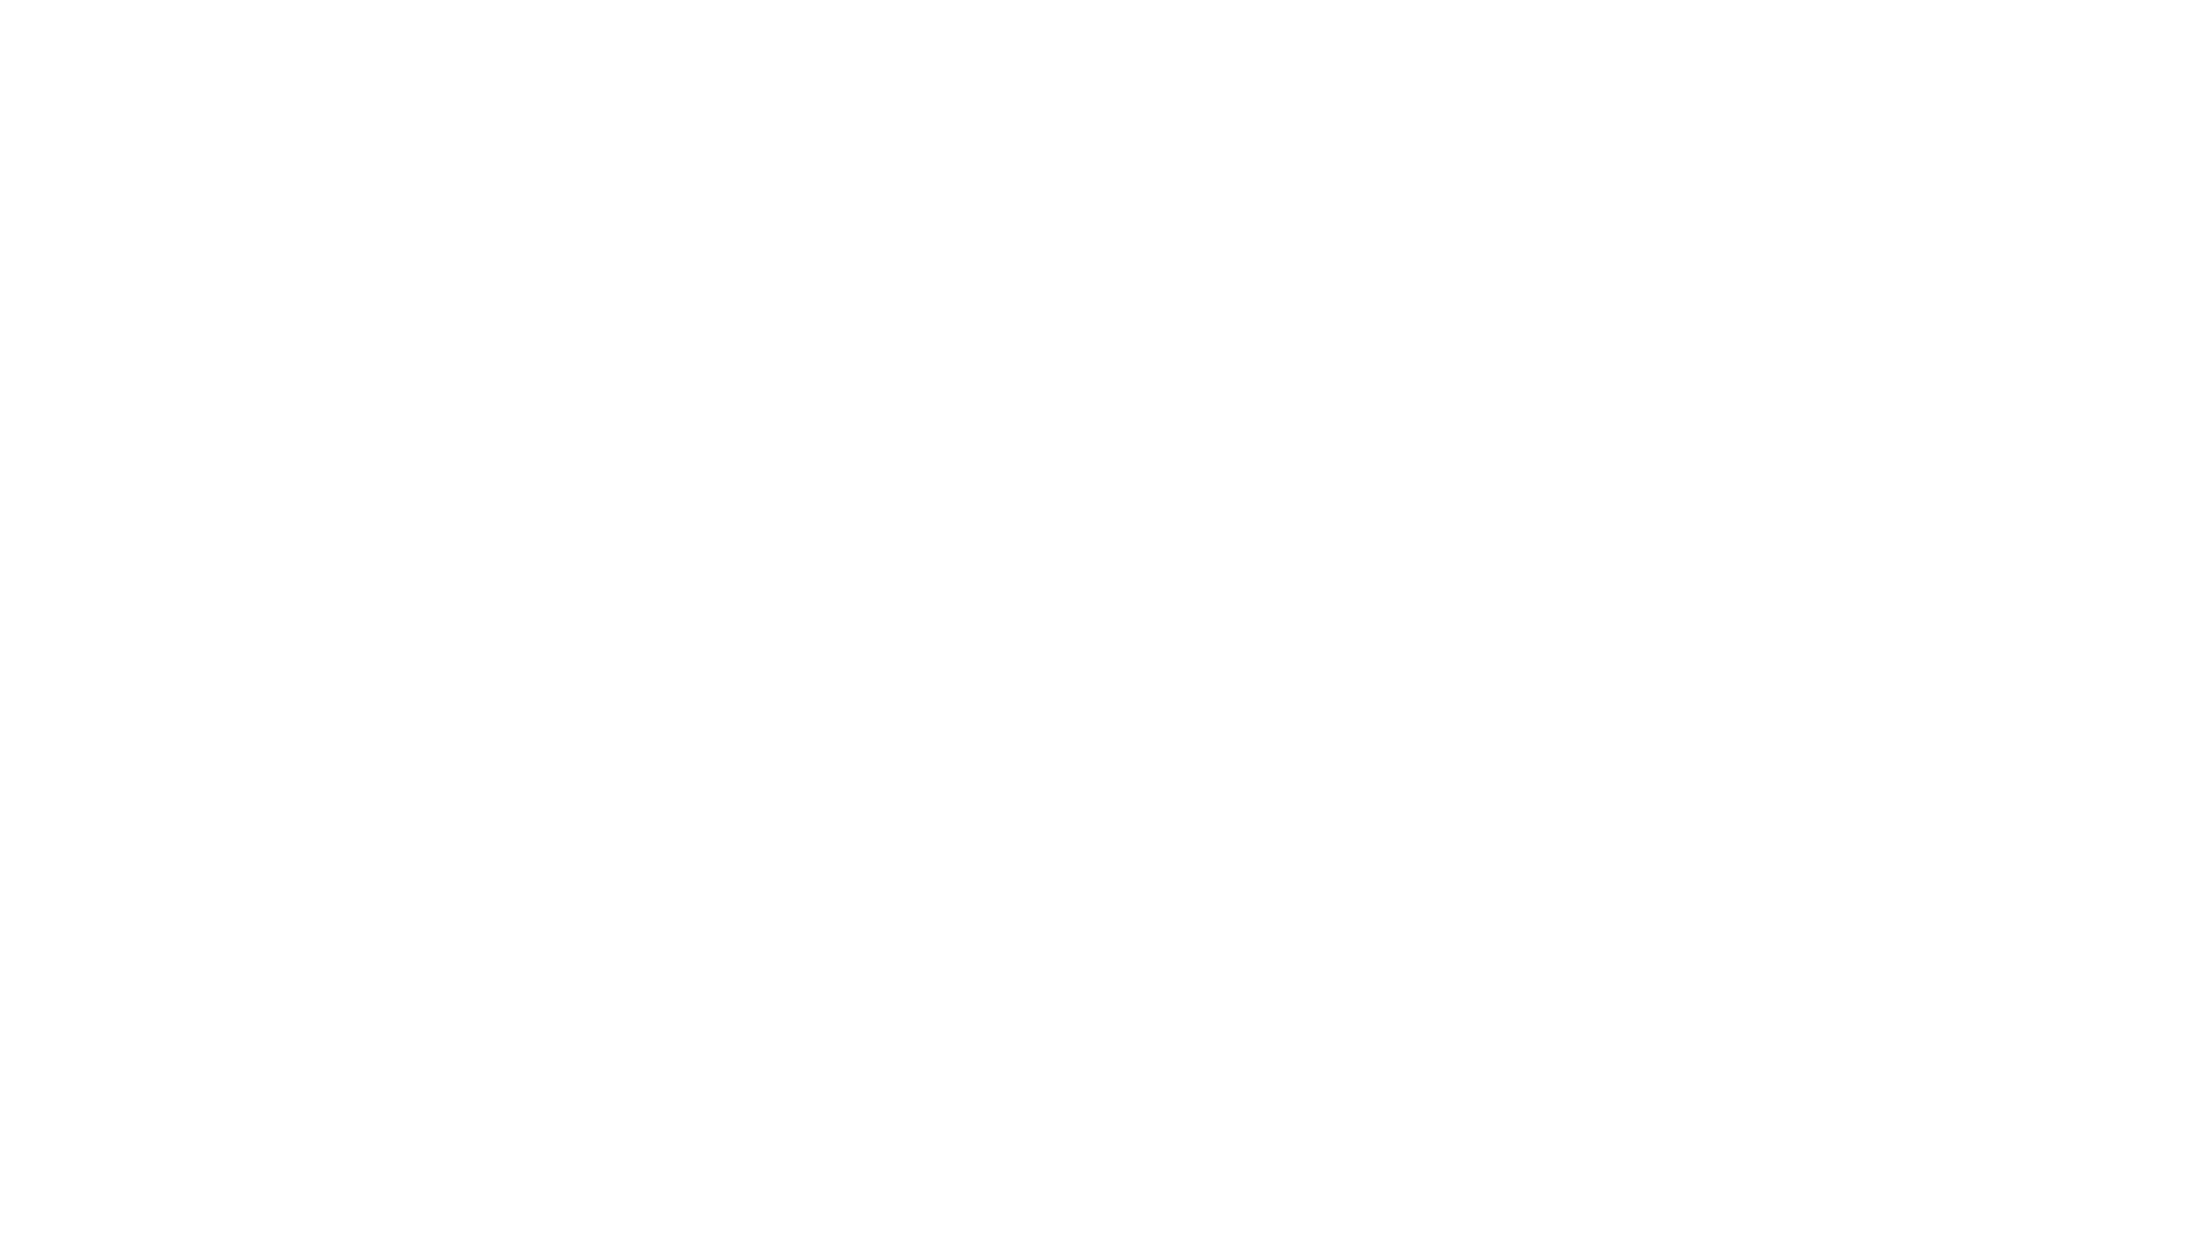 Clique Retire - Footer